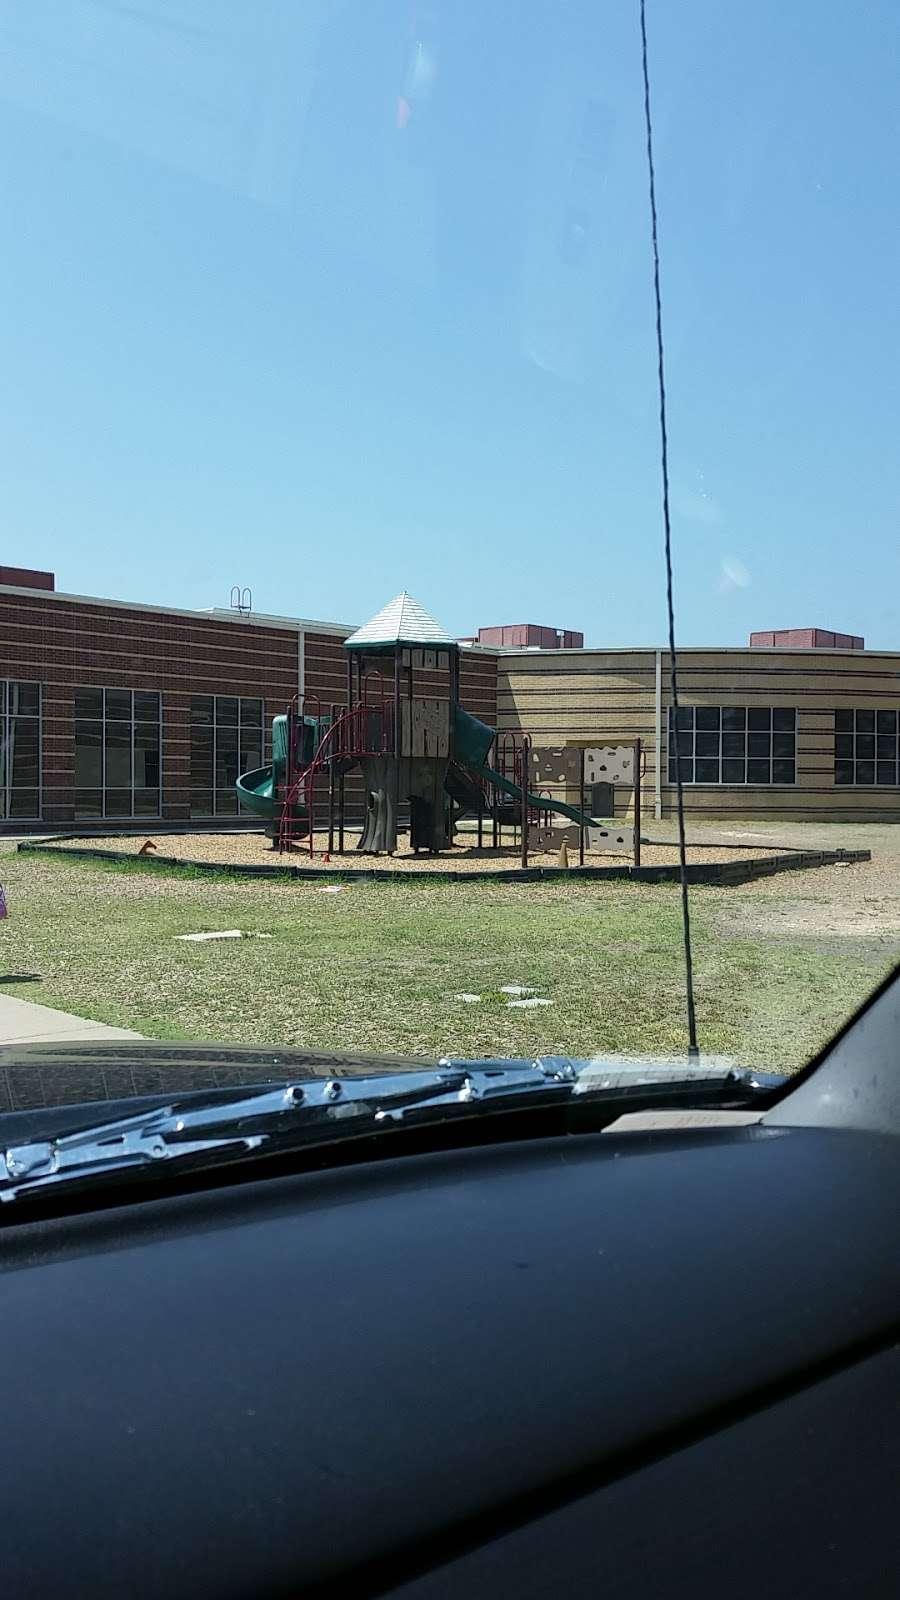 Jerry R. Junkins Elementary School - school  | Photo 1 of 2 | Address: 2808 Running Duke Dr, Carrollton, TX 75006, USA | Phone: (972) 502-2400